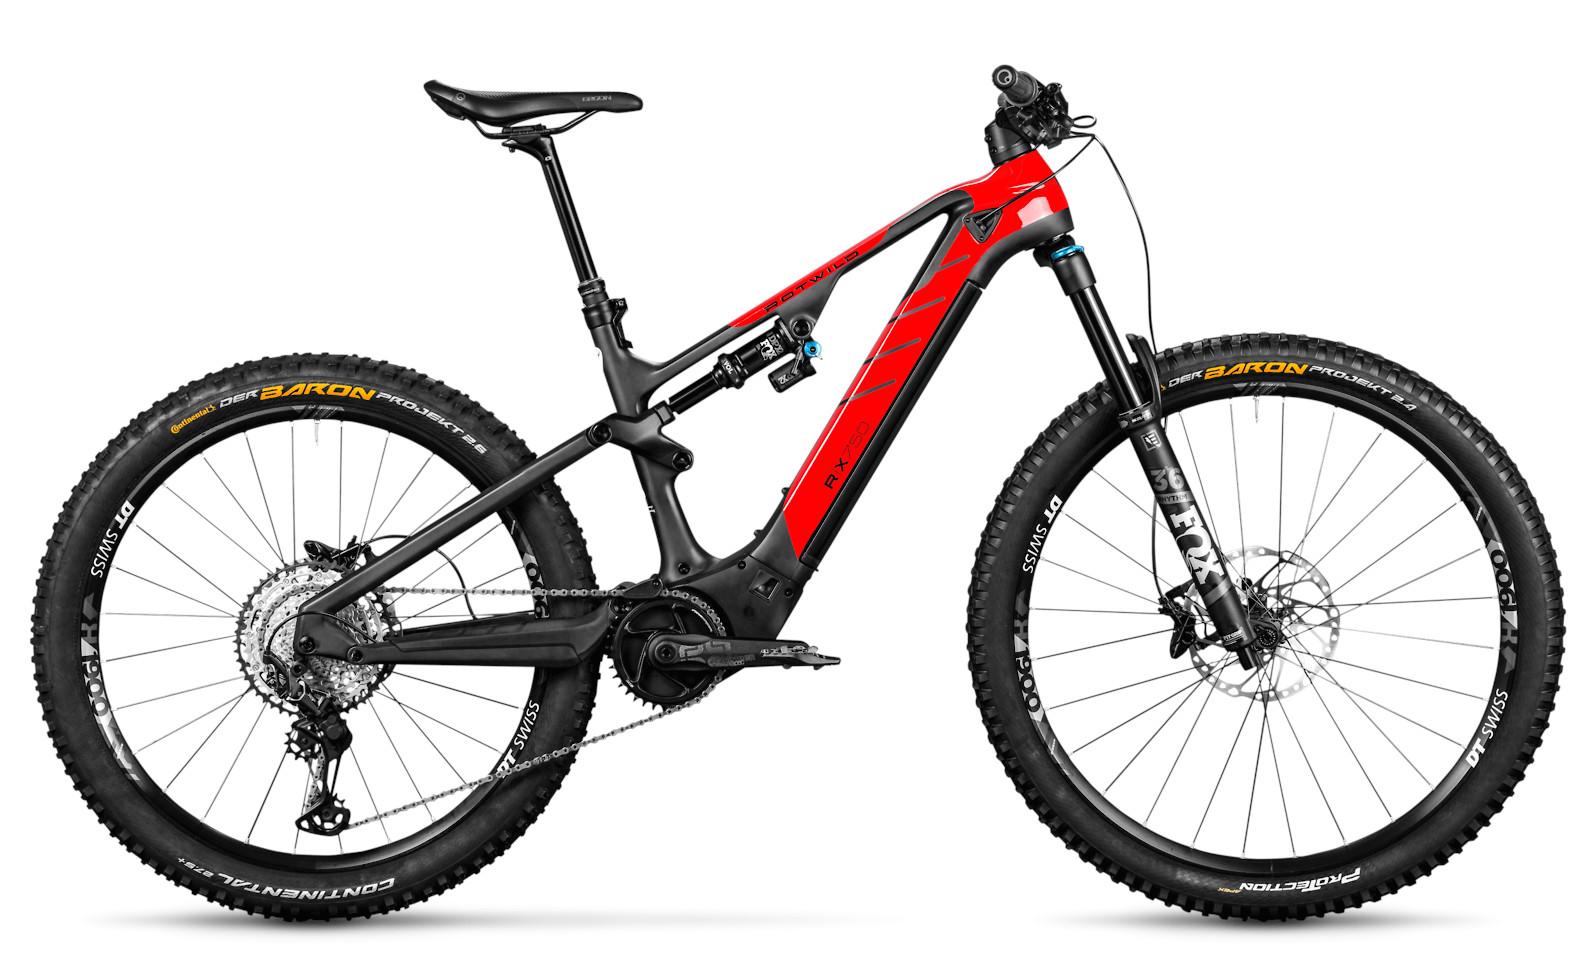 2020 Rotwild R.X750 Core